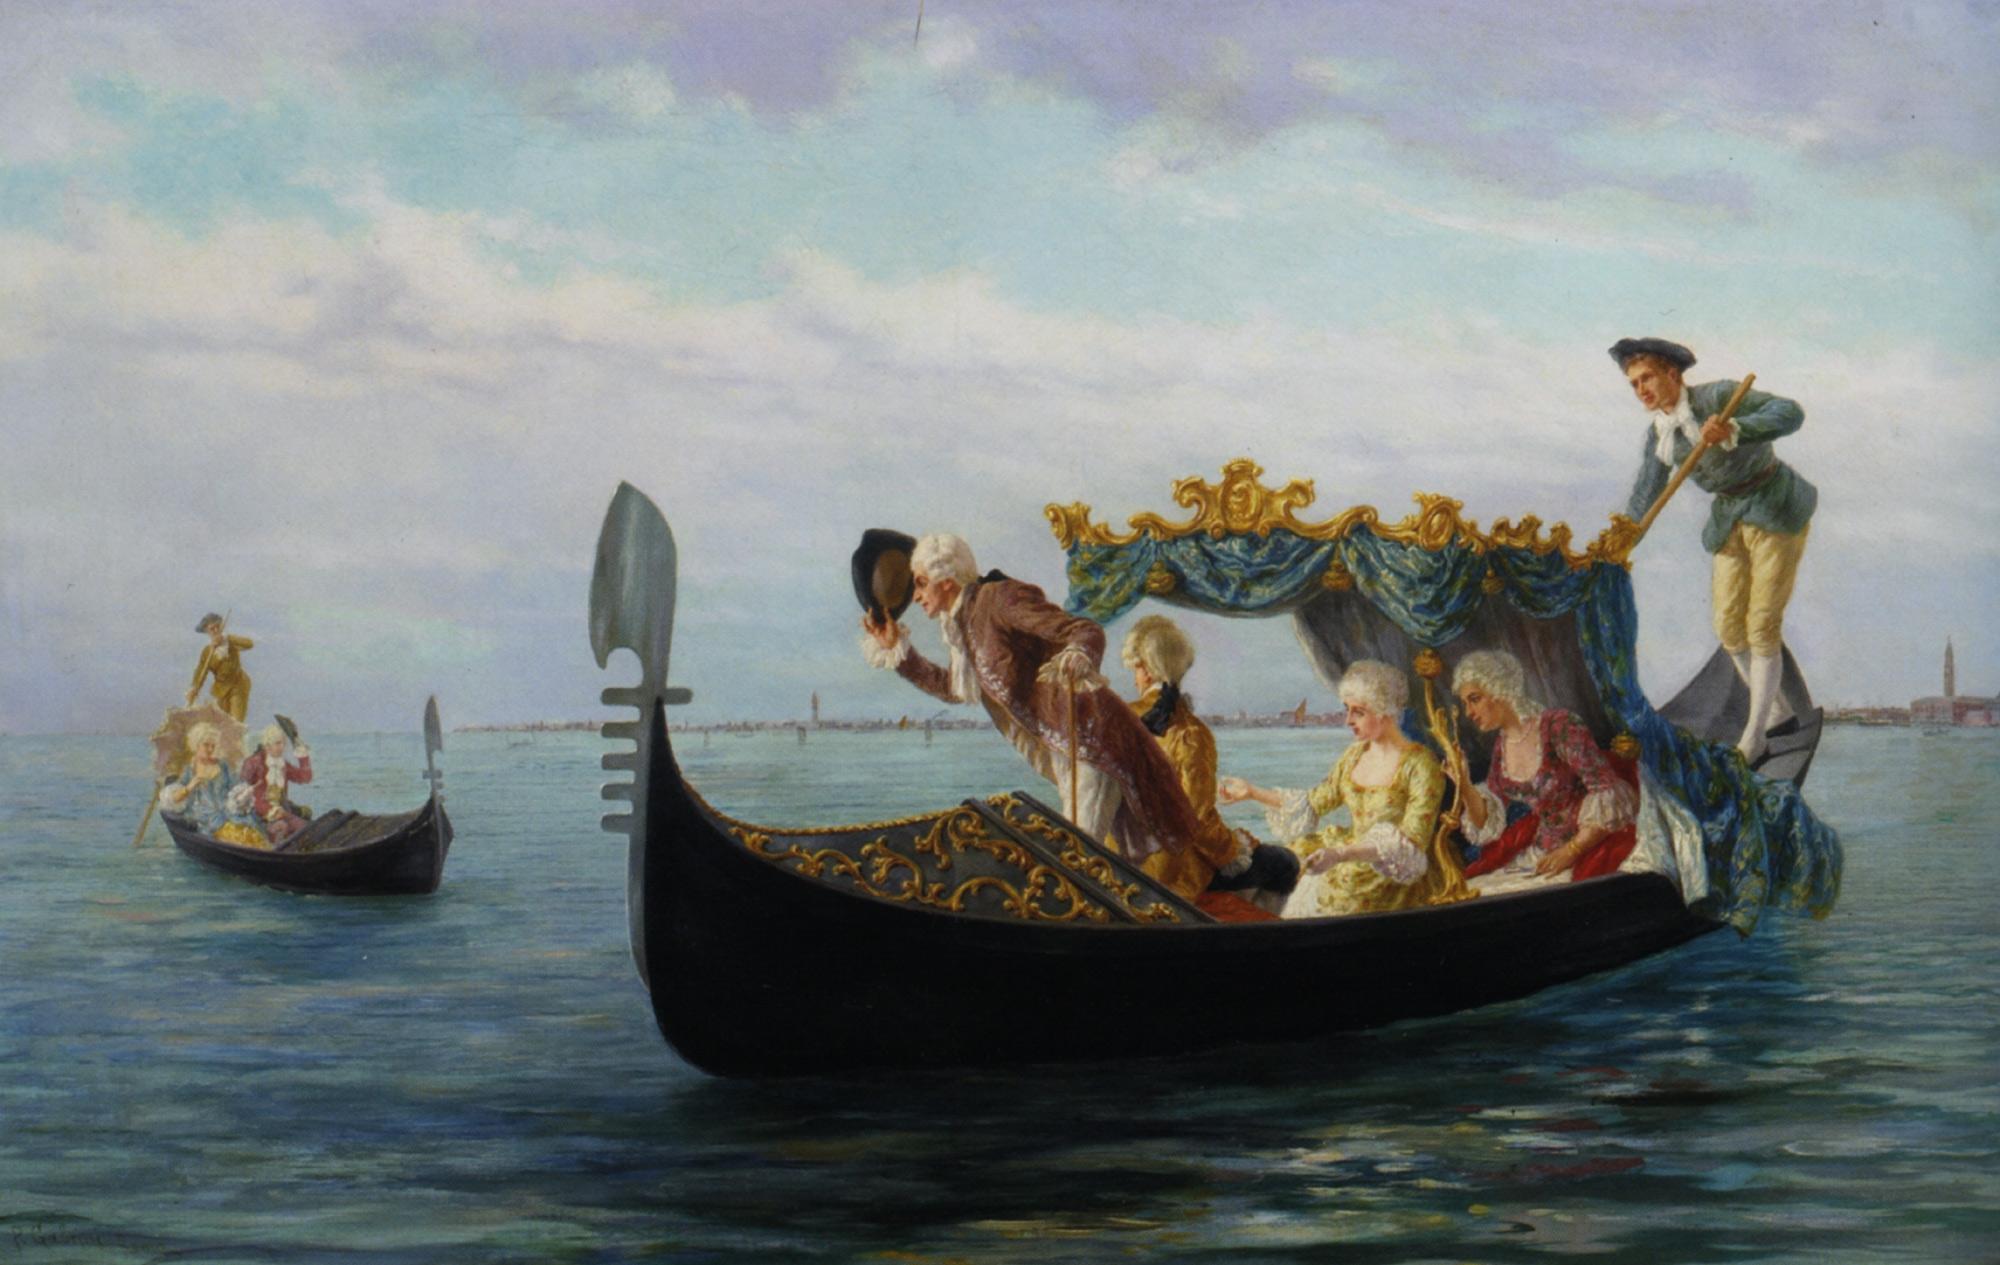 Elegant Couples in a Gondola :: Pietro Gabrini  - Romantic scenes in art and painting ôîòî